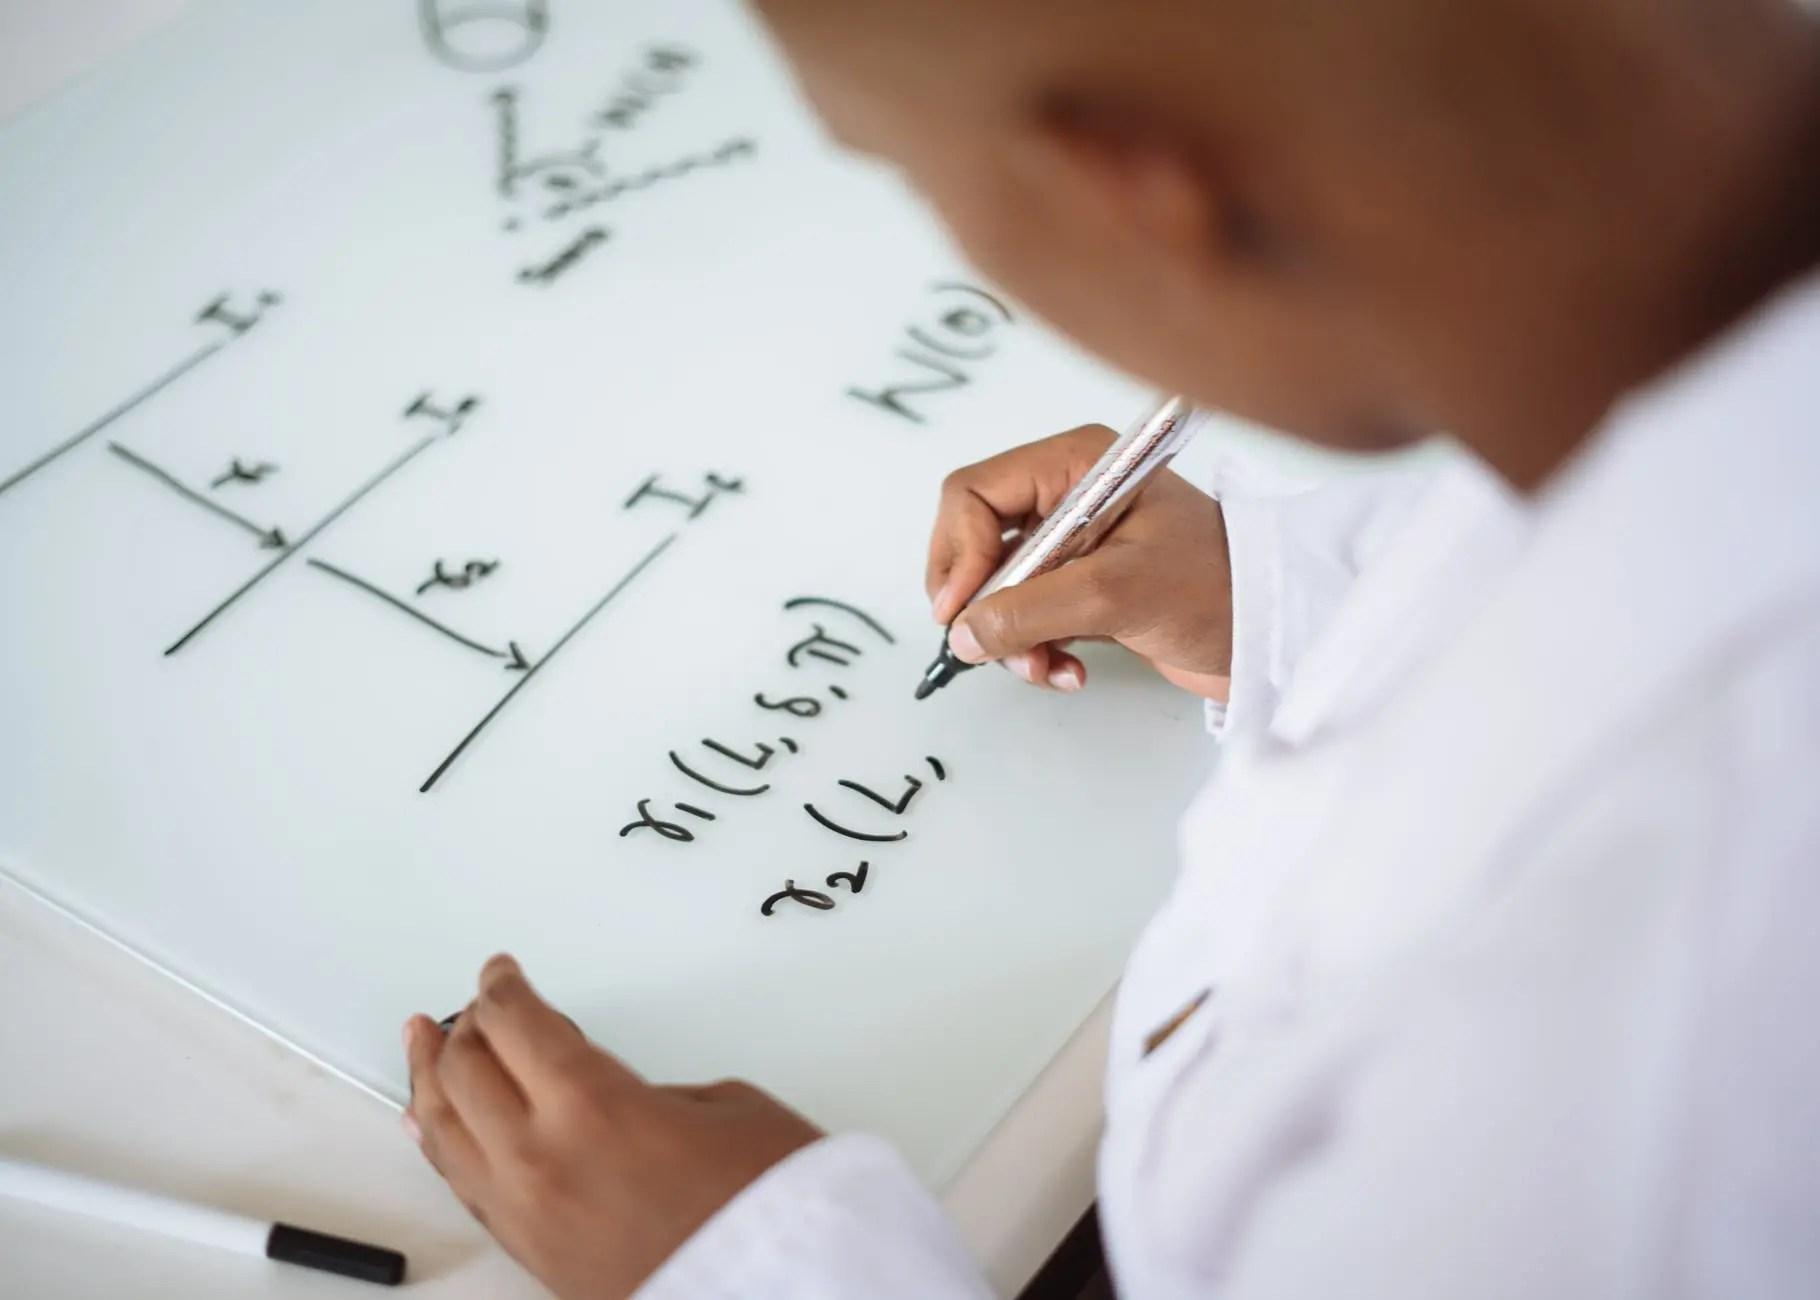 photo of person deriving formula on white board